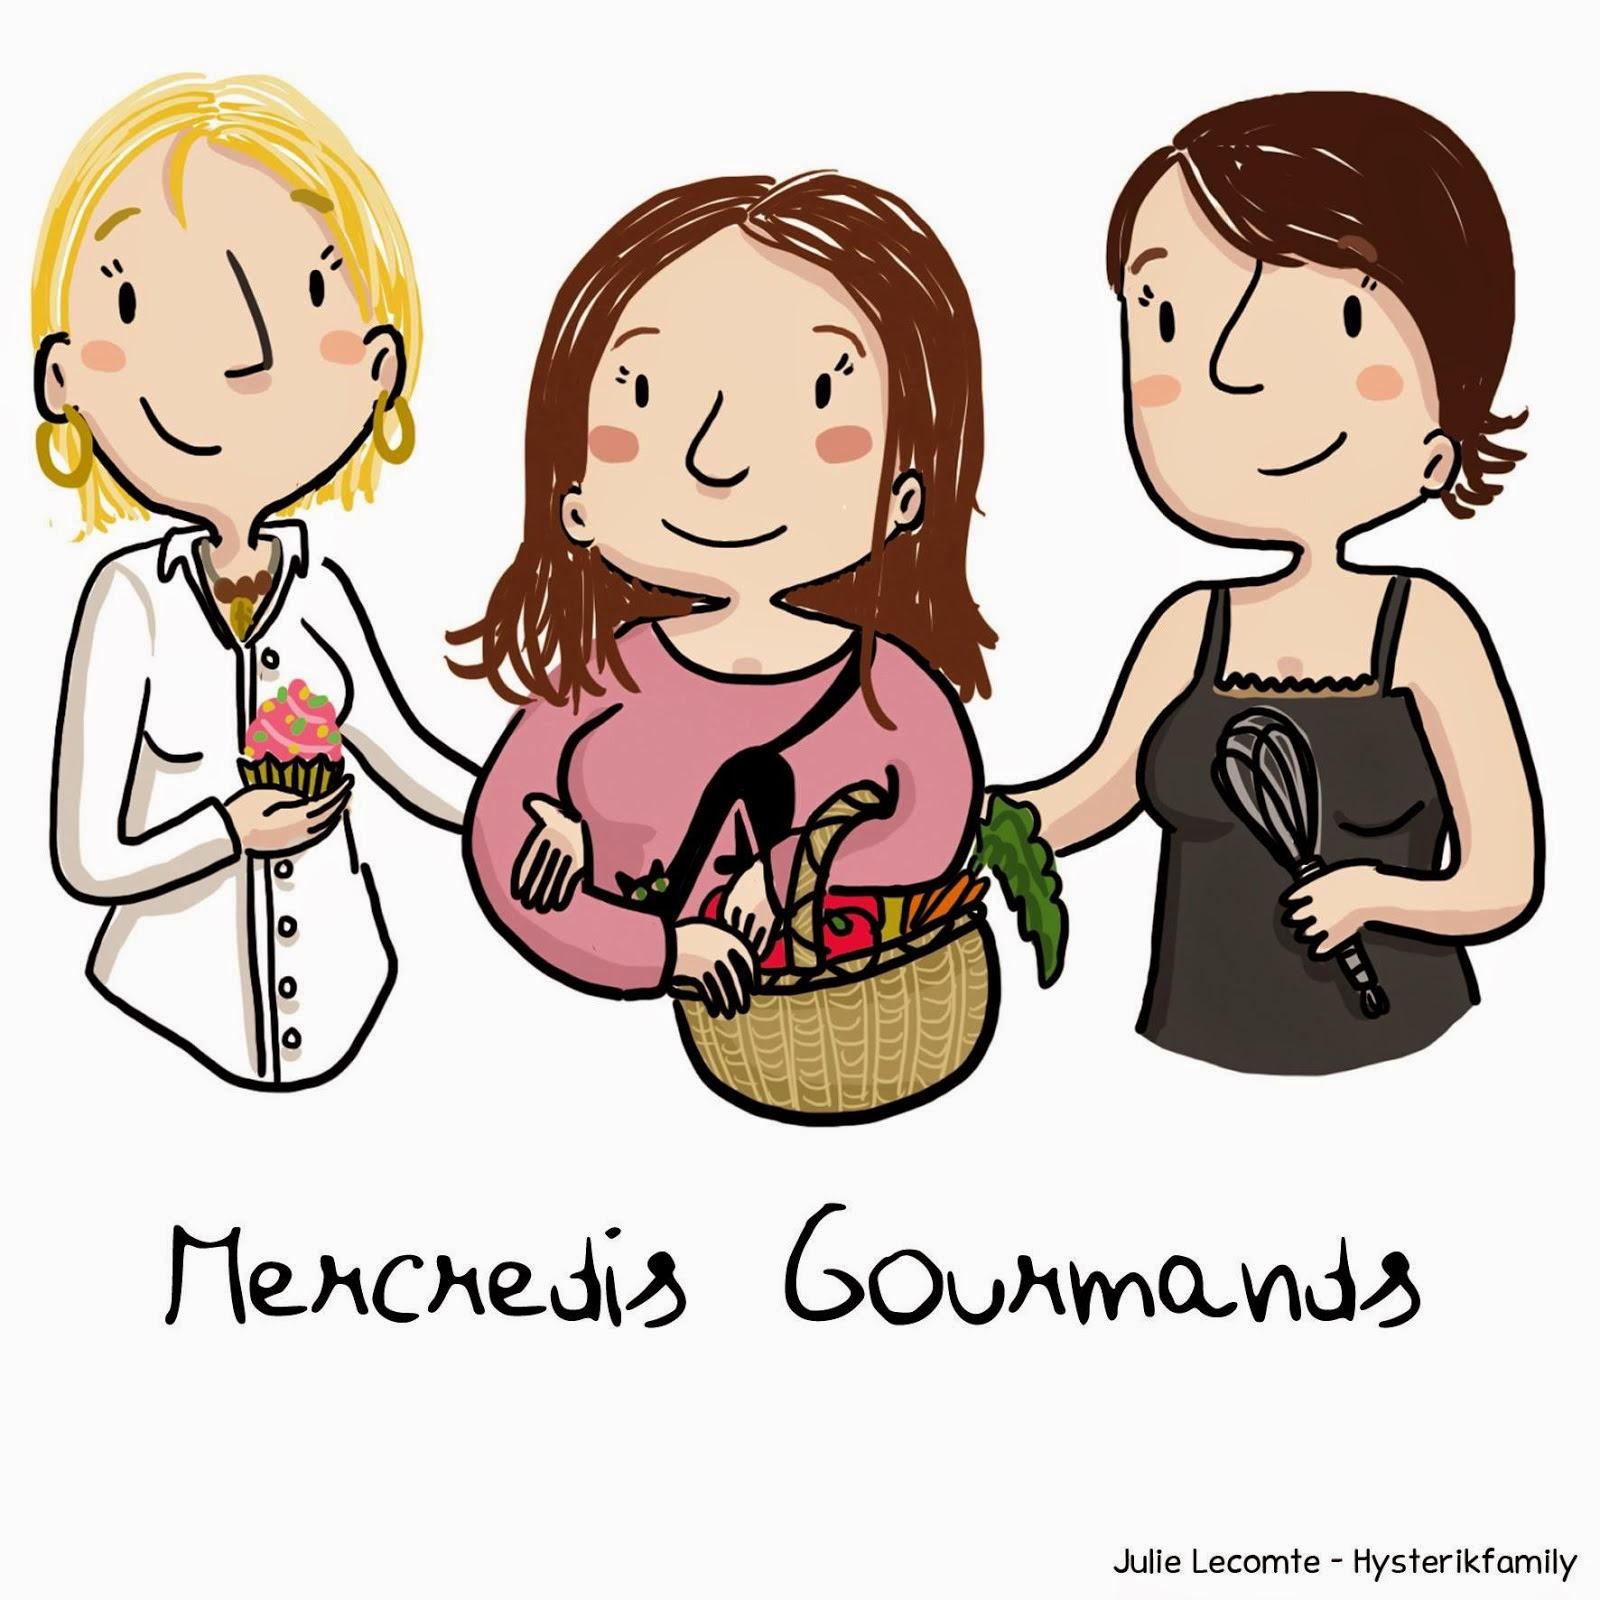 Les Mercredis Gourmands